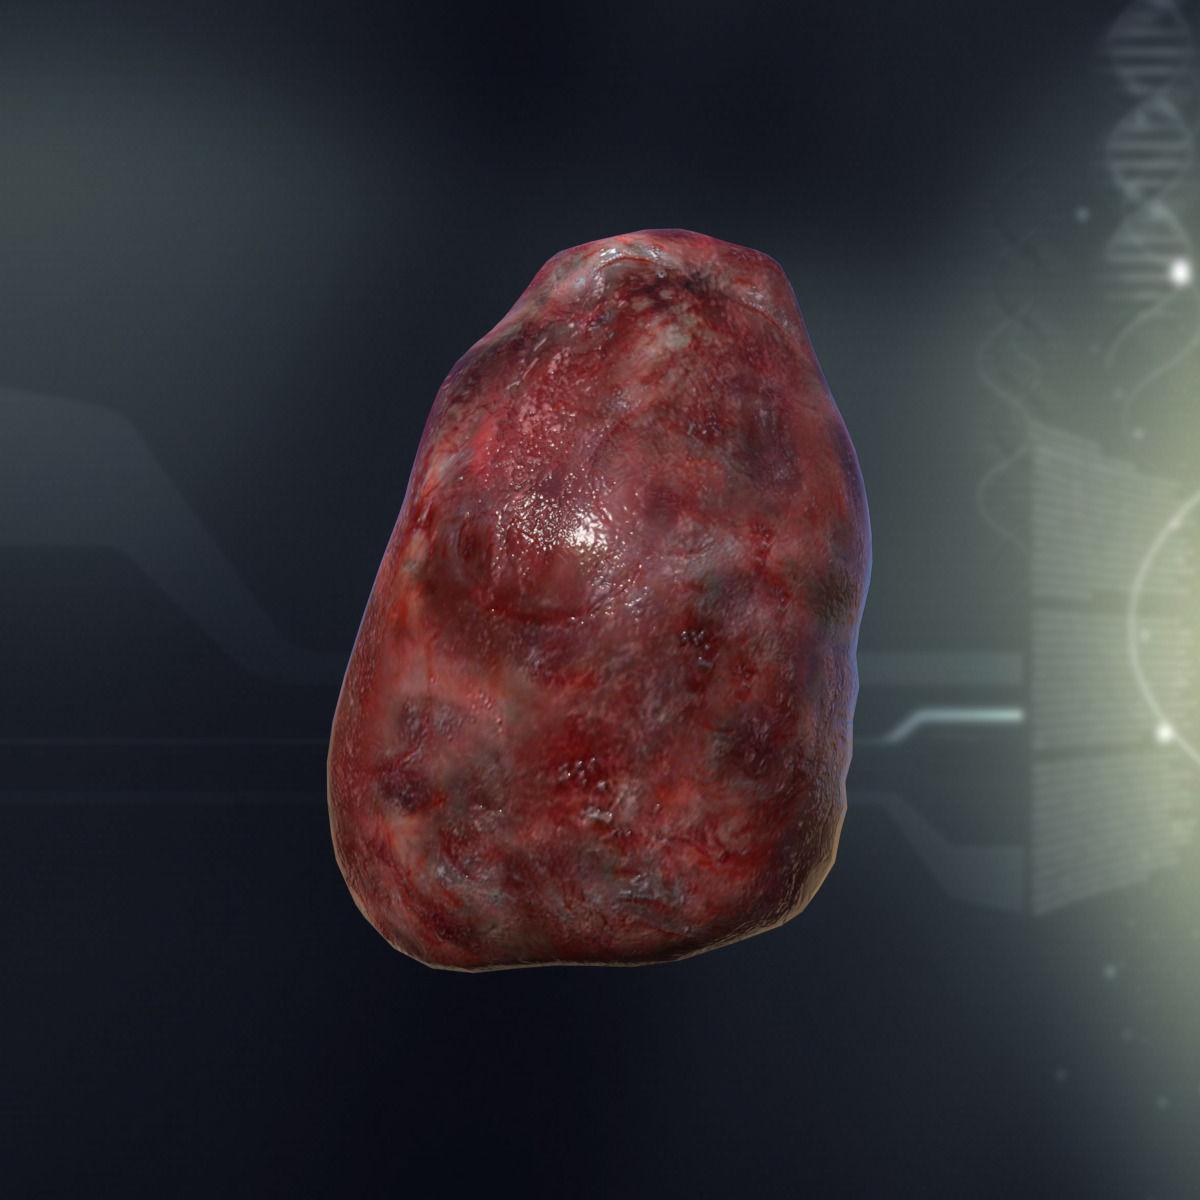 3d Model Human Spleen Anatomy Vr Ar Low Poly Max Obj 3ds Fbx C4d Lwo Lw Lws